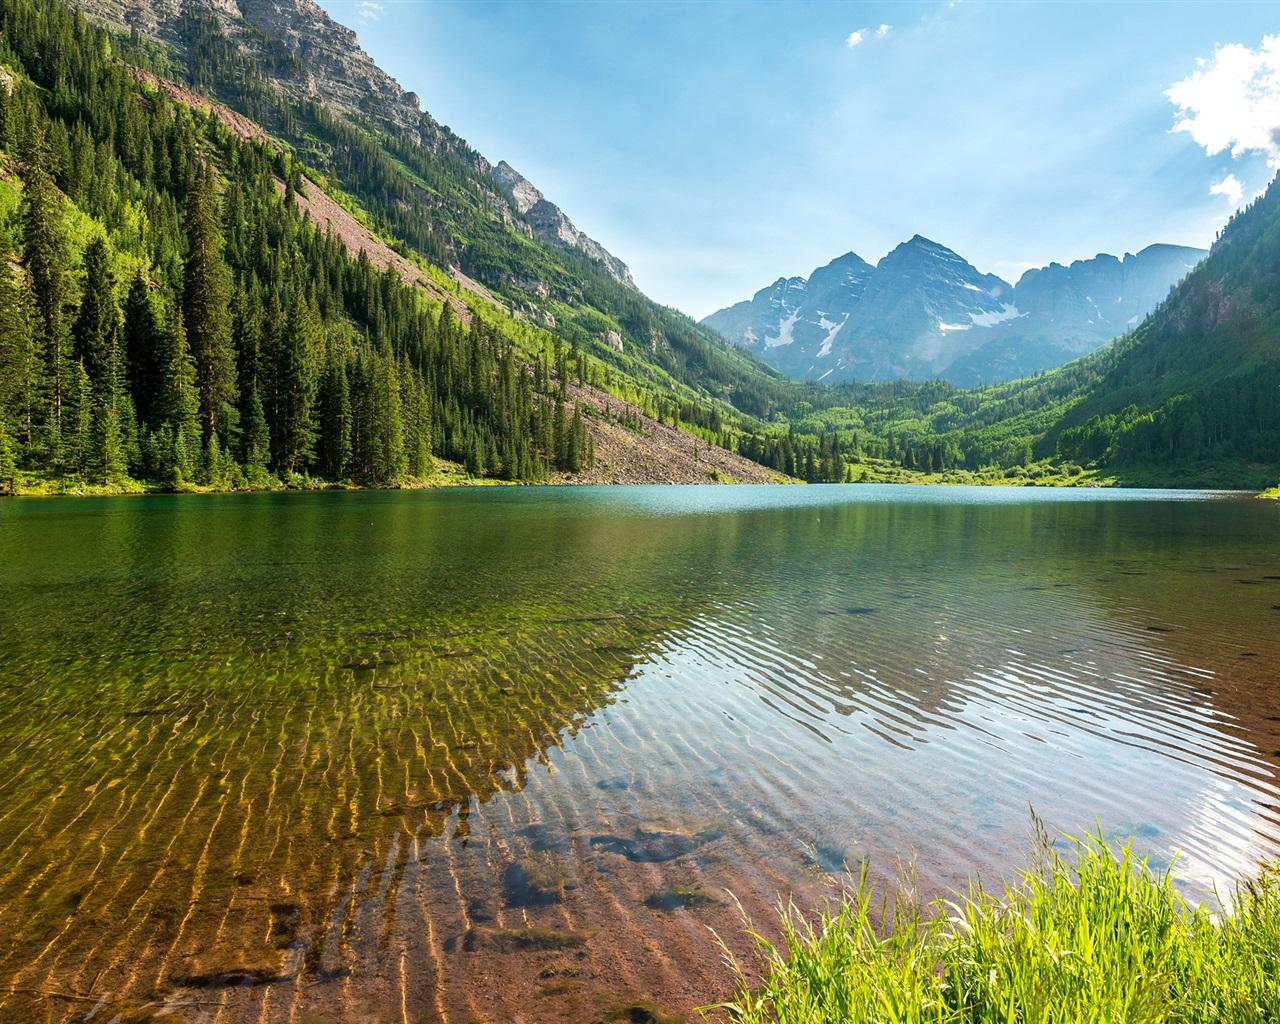 mountains sky lake reflection - photo #30